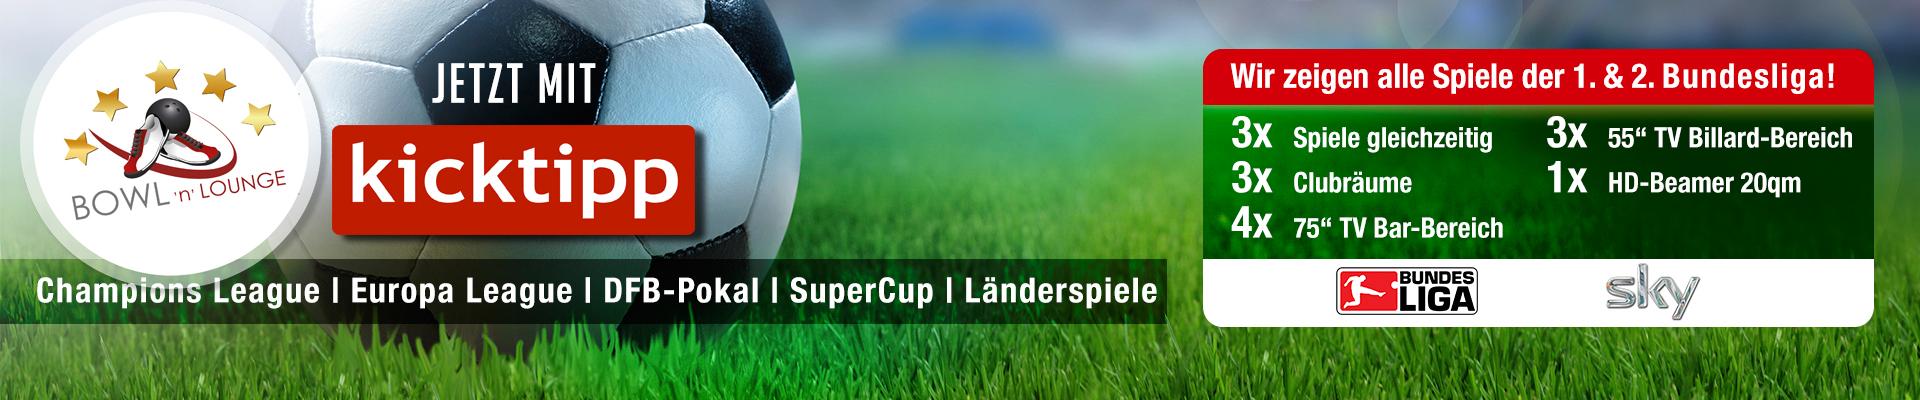 trenner_BowlnLounge_Bundesliga1_NEU